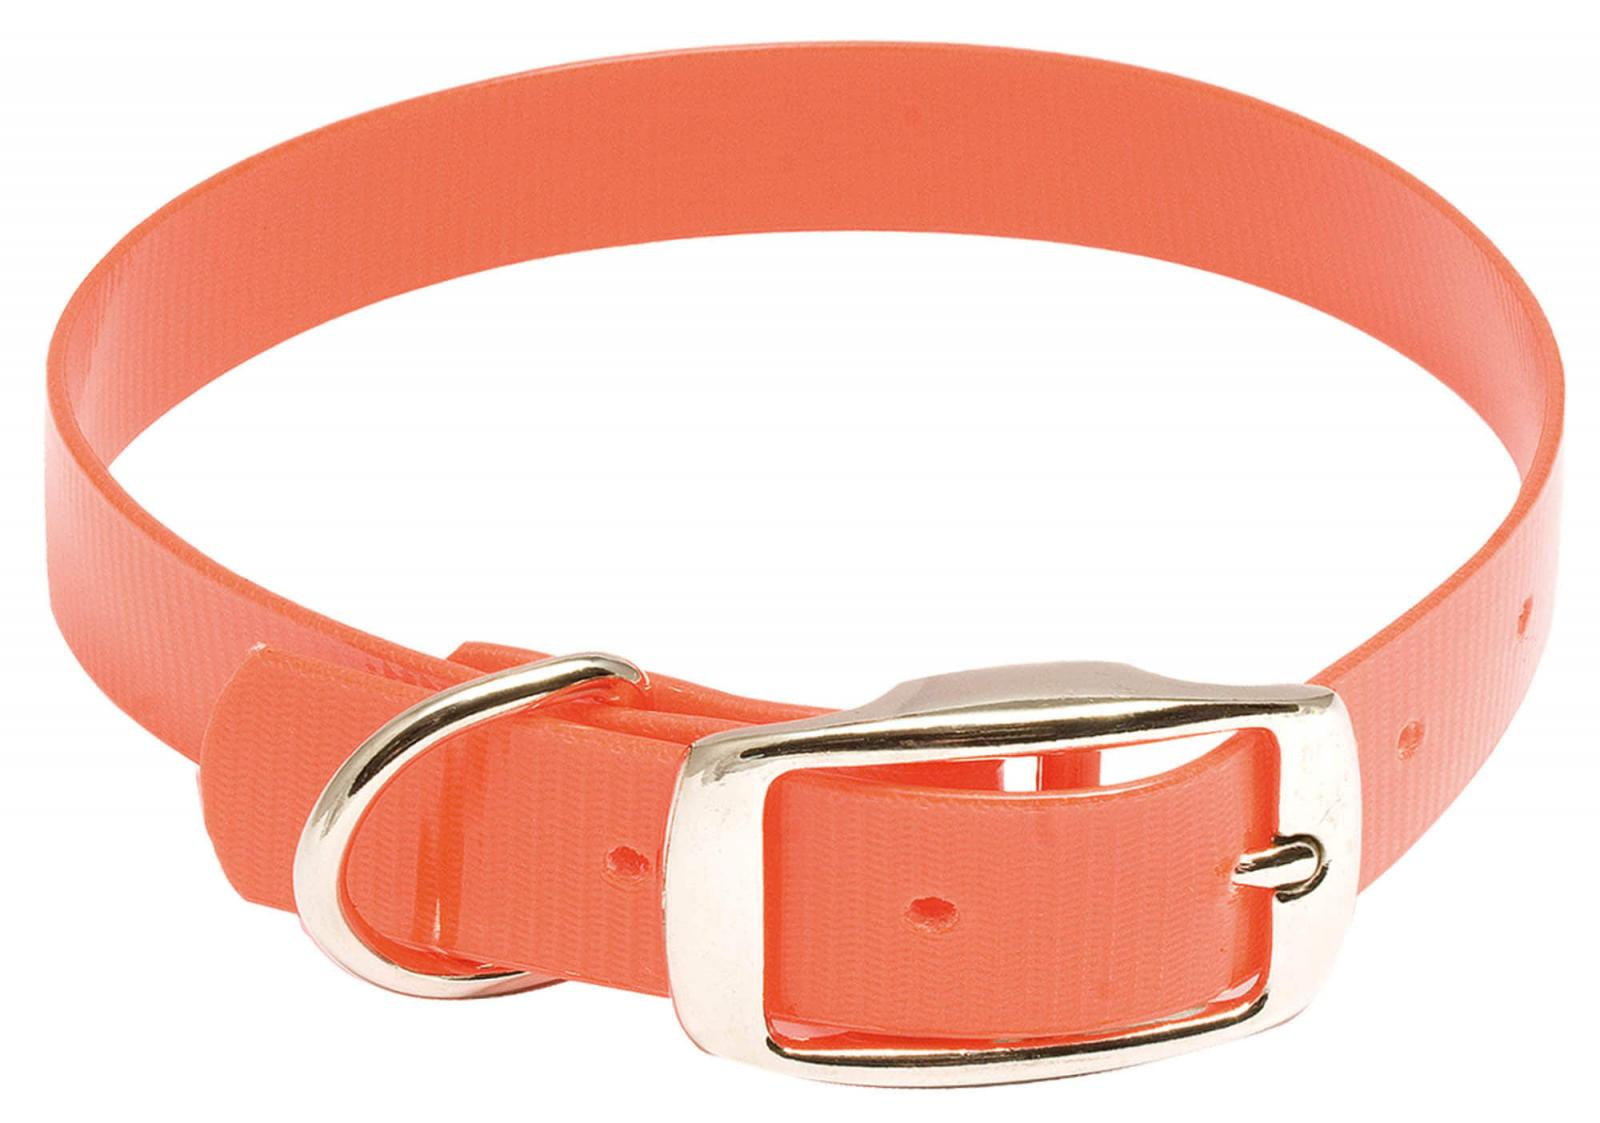 Collier Orange Fluo HIFLEX - COUNTRY 20mm x 40 cm